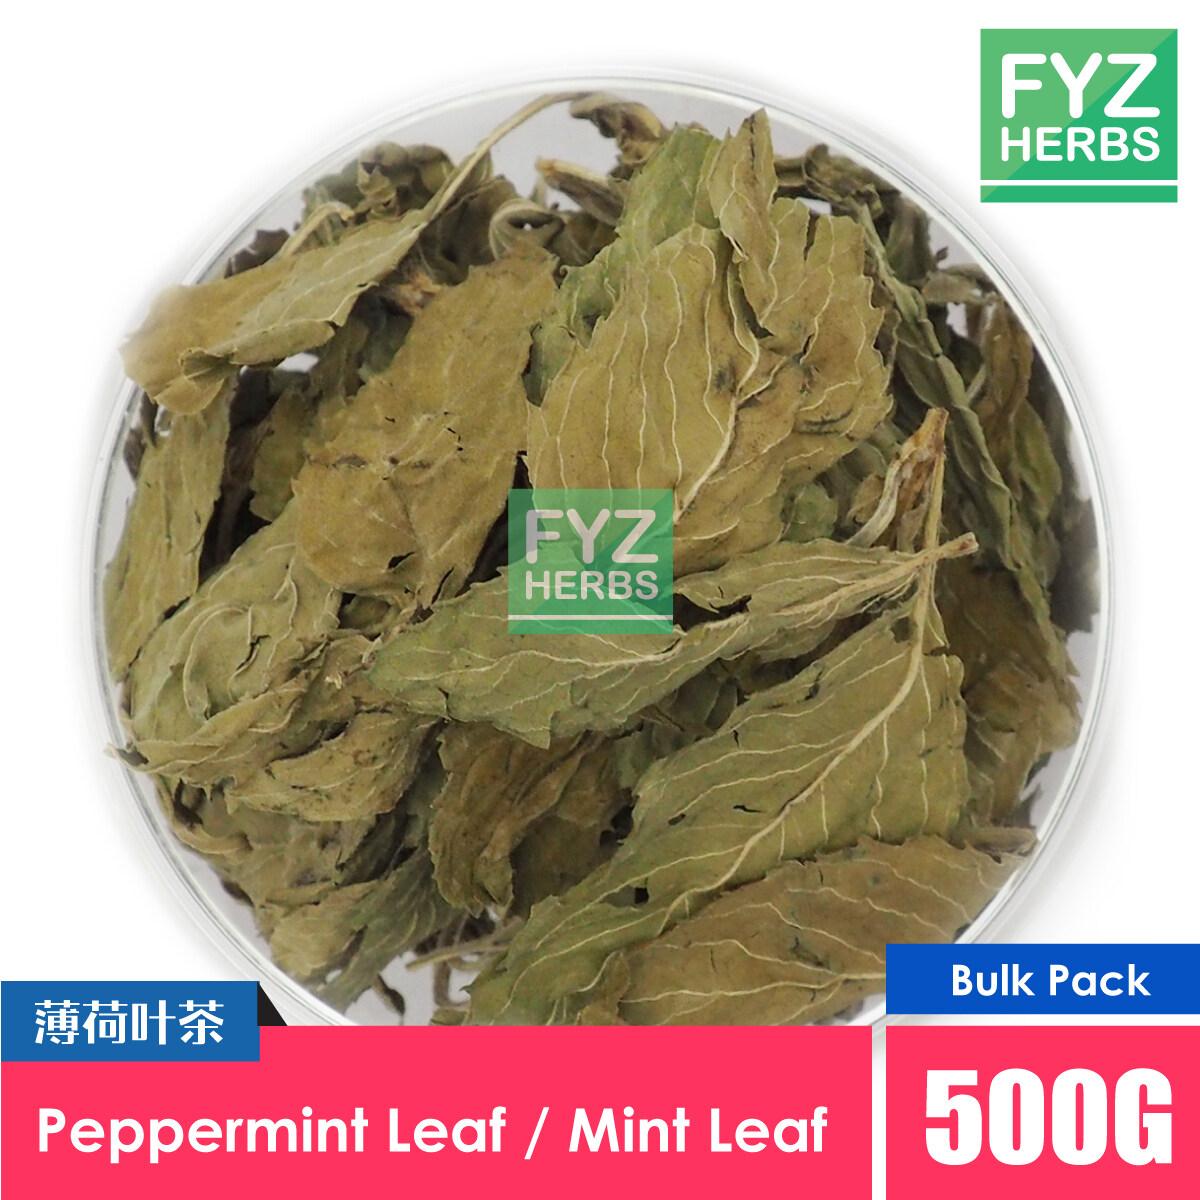 FYZ Herbs Peppermint Leaf 500G [Bulk Pack] 薄荷叶袋装 500G